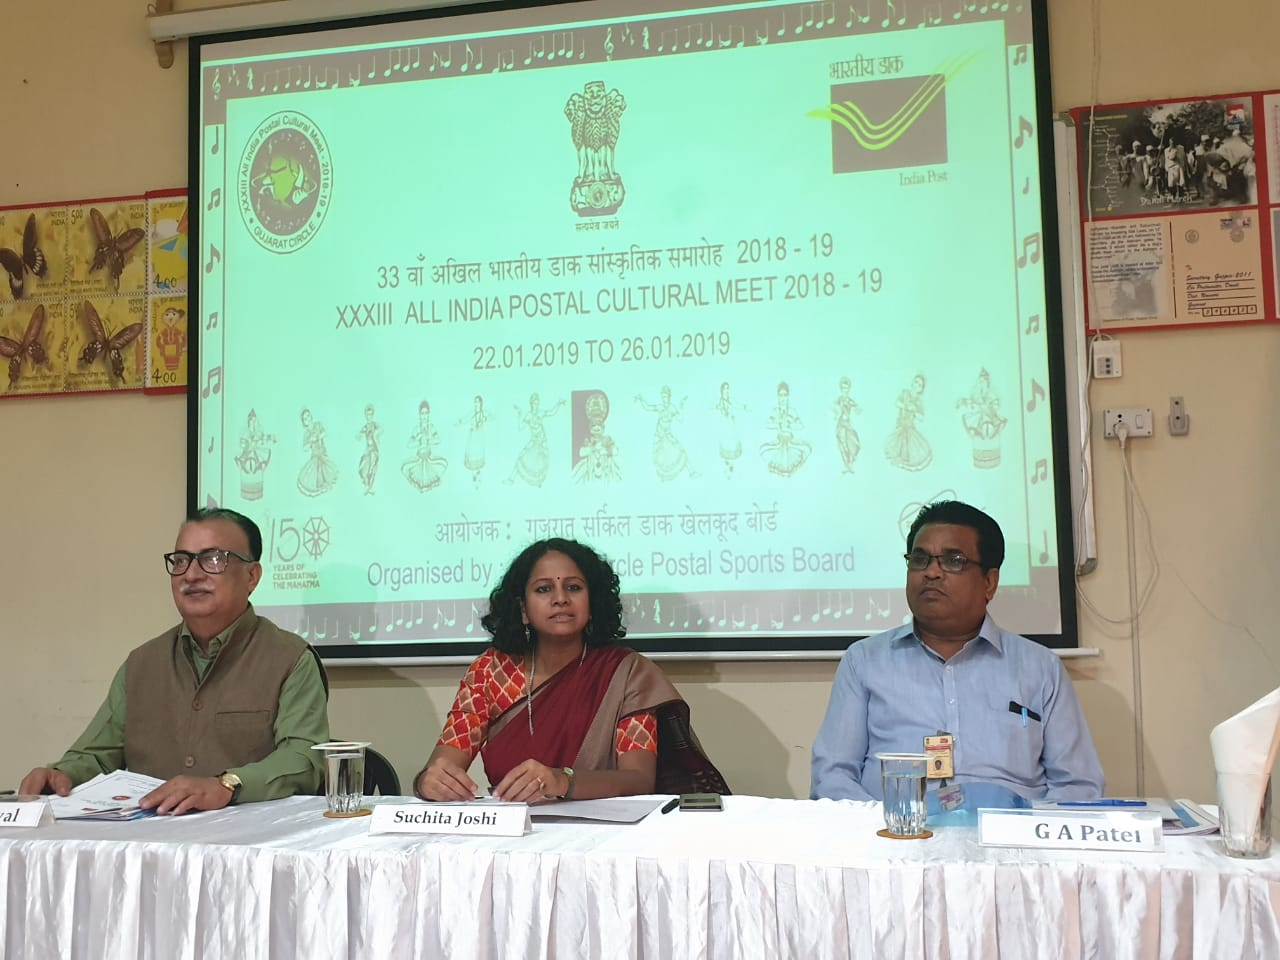 Vadodara will host 33rd All India Postal Cultural Meet